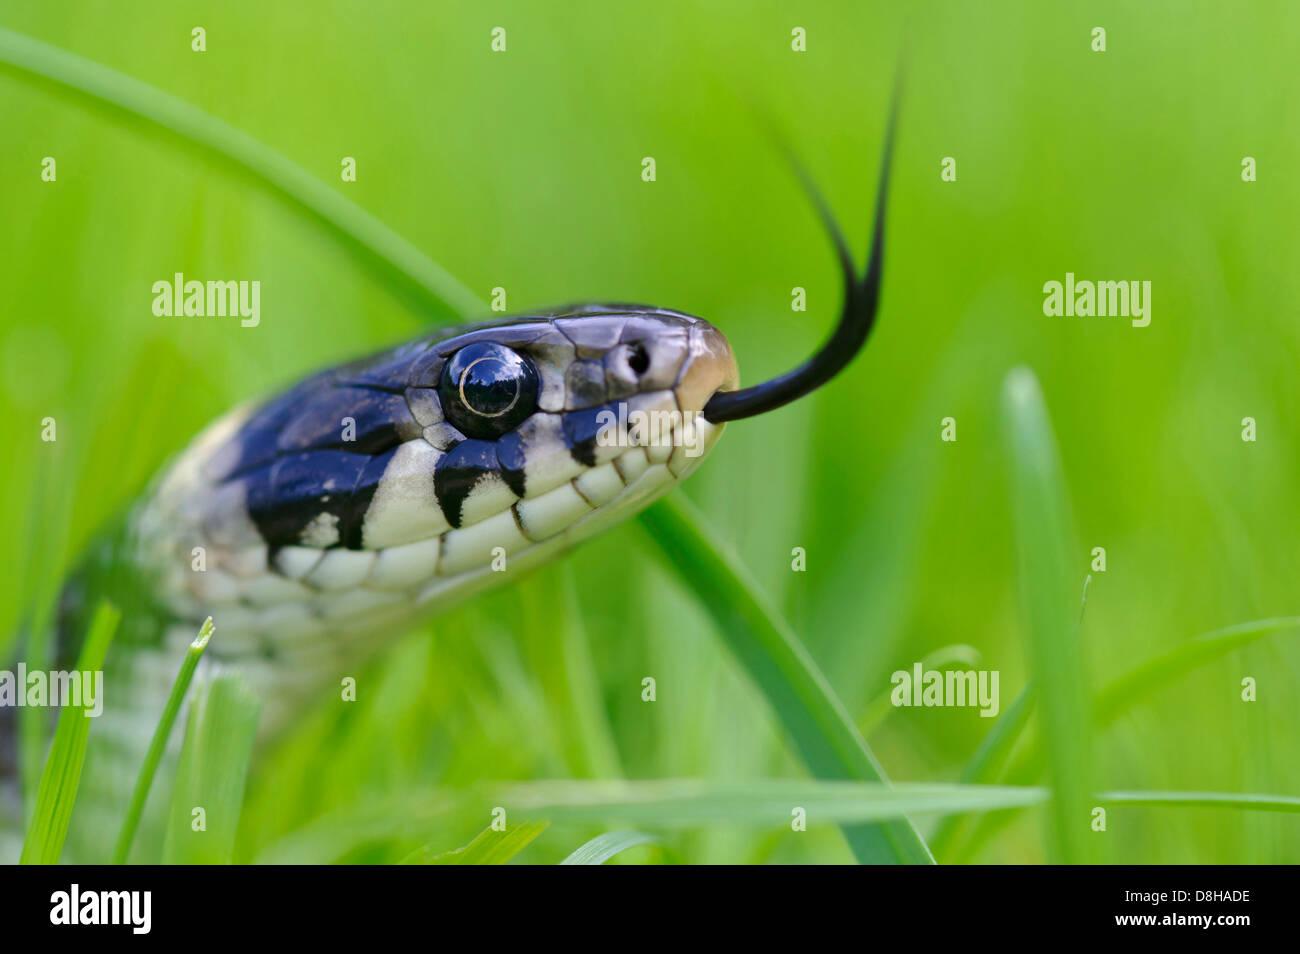 grass snake, natrix natrix, goldenstedter moor, lower saxony, germany - Stock Image